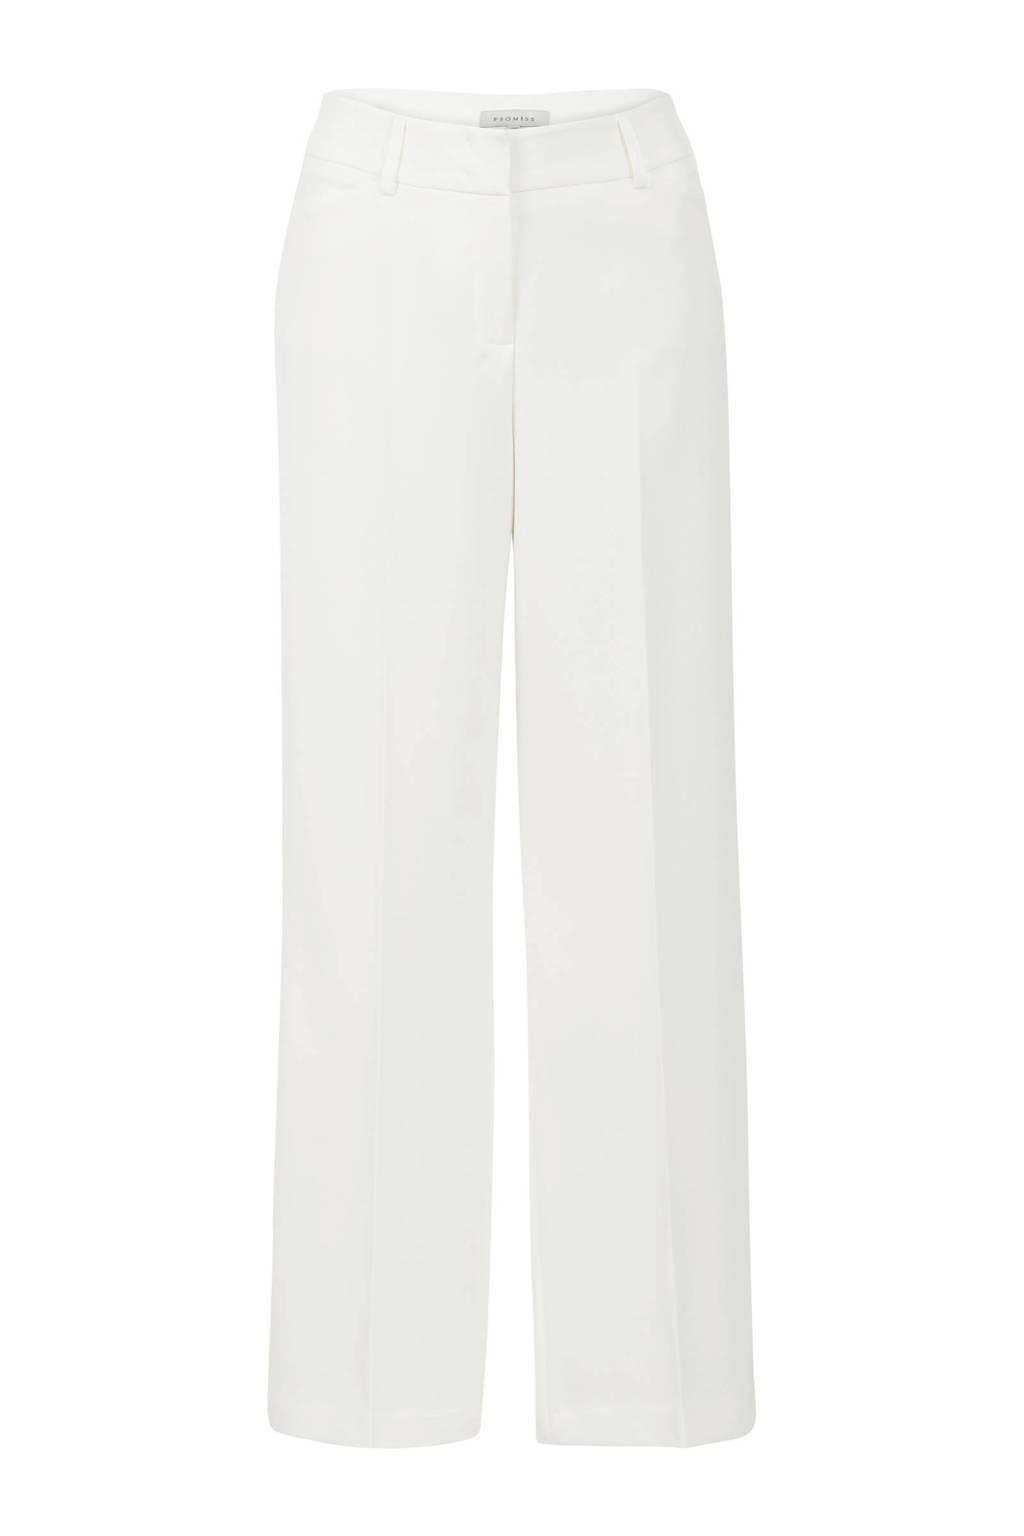 Promiss straight fit pantalon wit, Wit